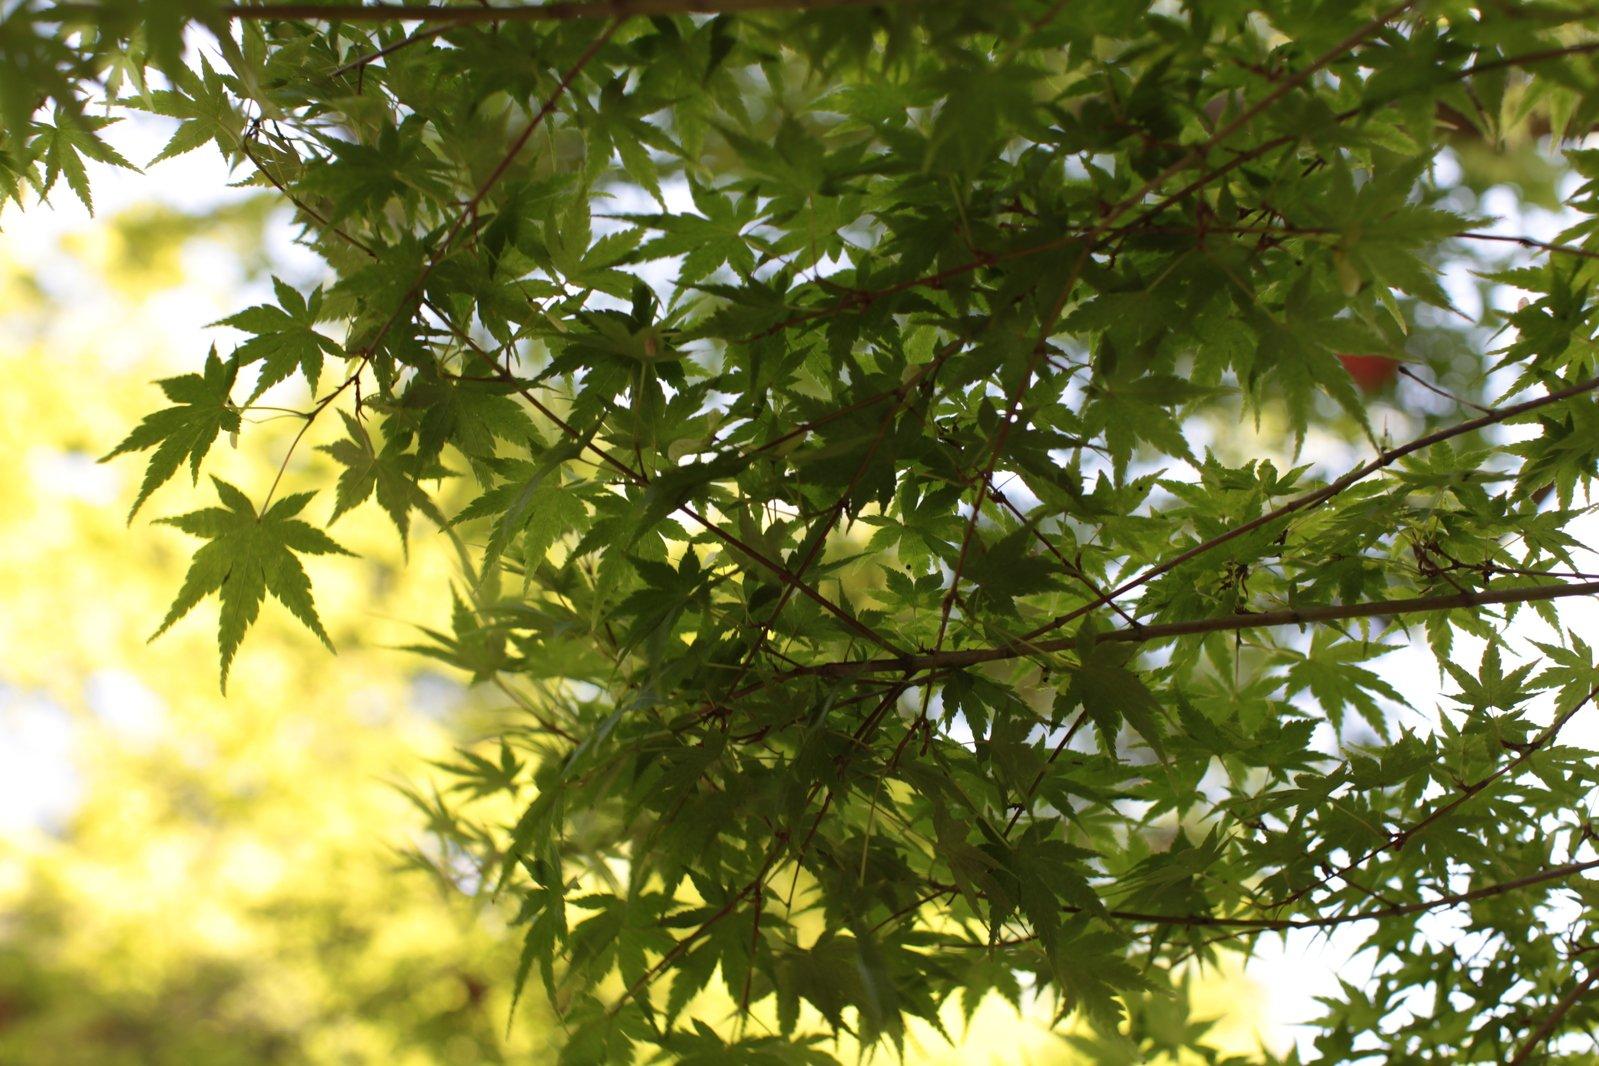 Acero Giapponese Verde free foglia di acero giapponese verde in estate stock photo